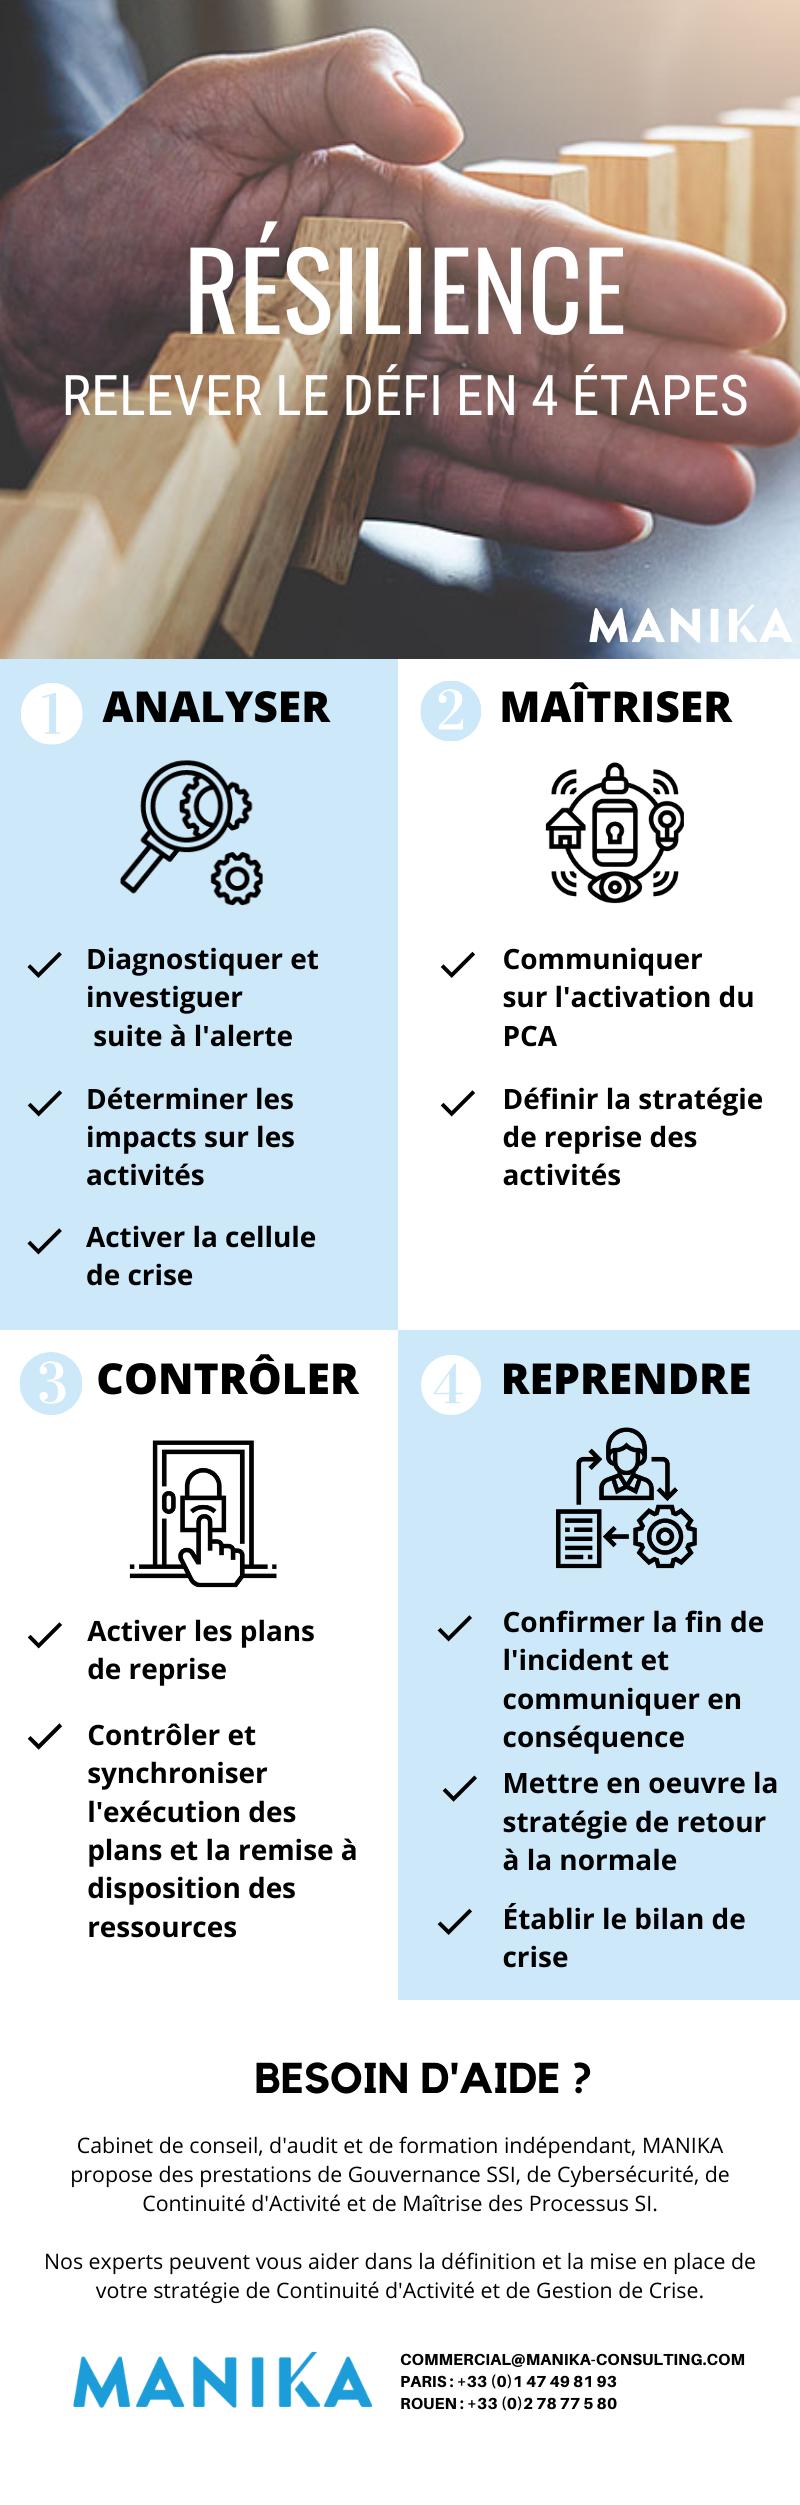 infographie resilience en 4 etapes manika